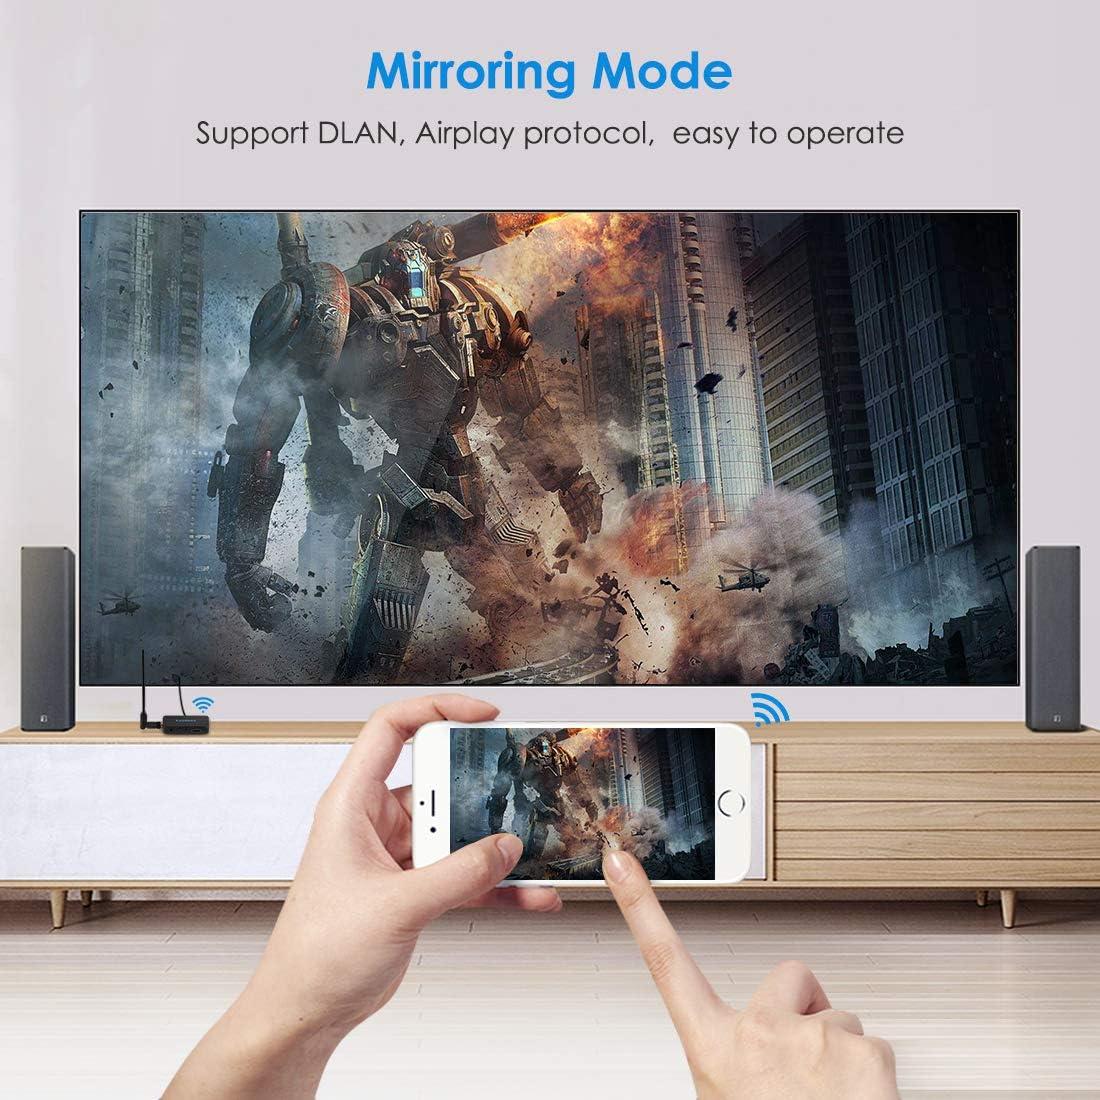 Leelbox Chromecast, WiFi Display Dongle, Adaptador de Receptor 4K 1080P HDMI Dongle Inalambrico con Pantalla WiFi 2.4G Miracast DLNA Airplay para iOS/Android/Mac/iPhone/Tableta: Amazon.es: Electrónica